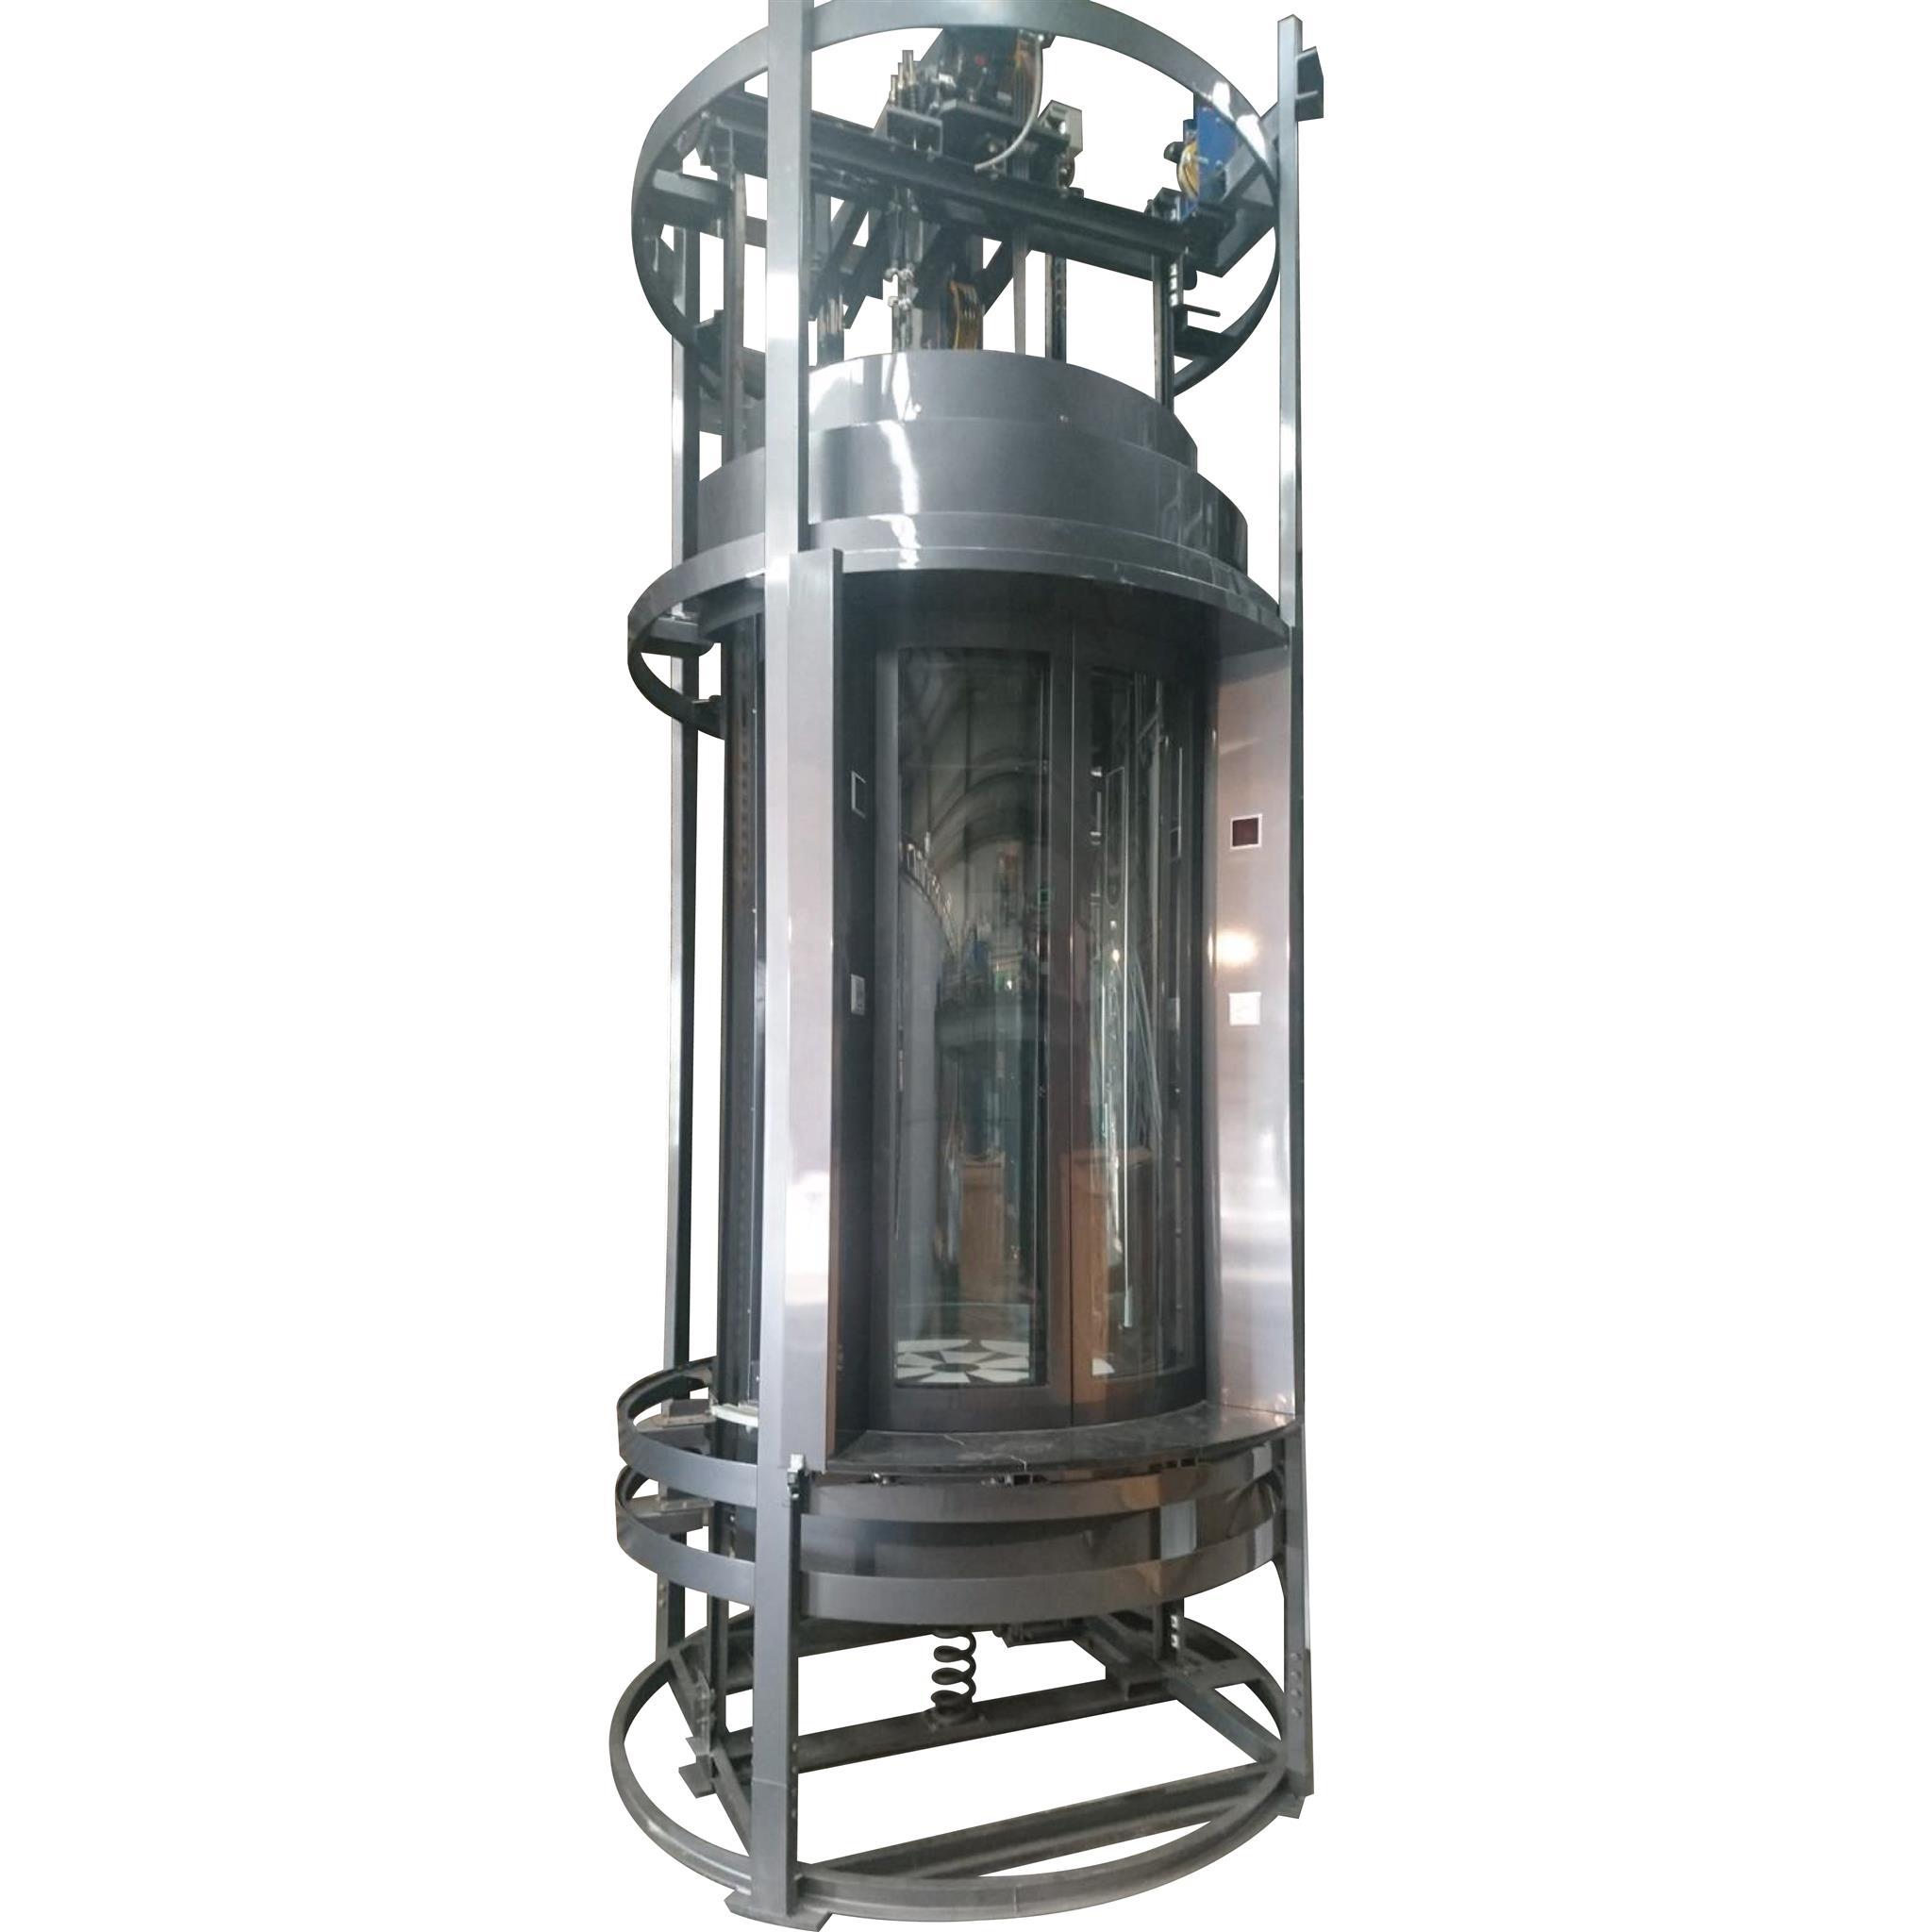 E-FENG MACHINERY ENGINEERING CO., LTD.-OBH Circular Panoramic Elevator